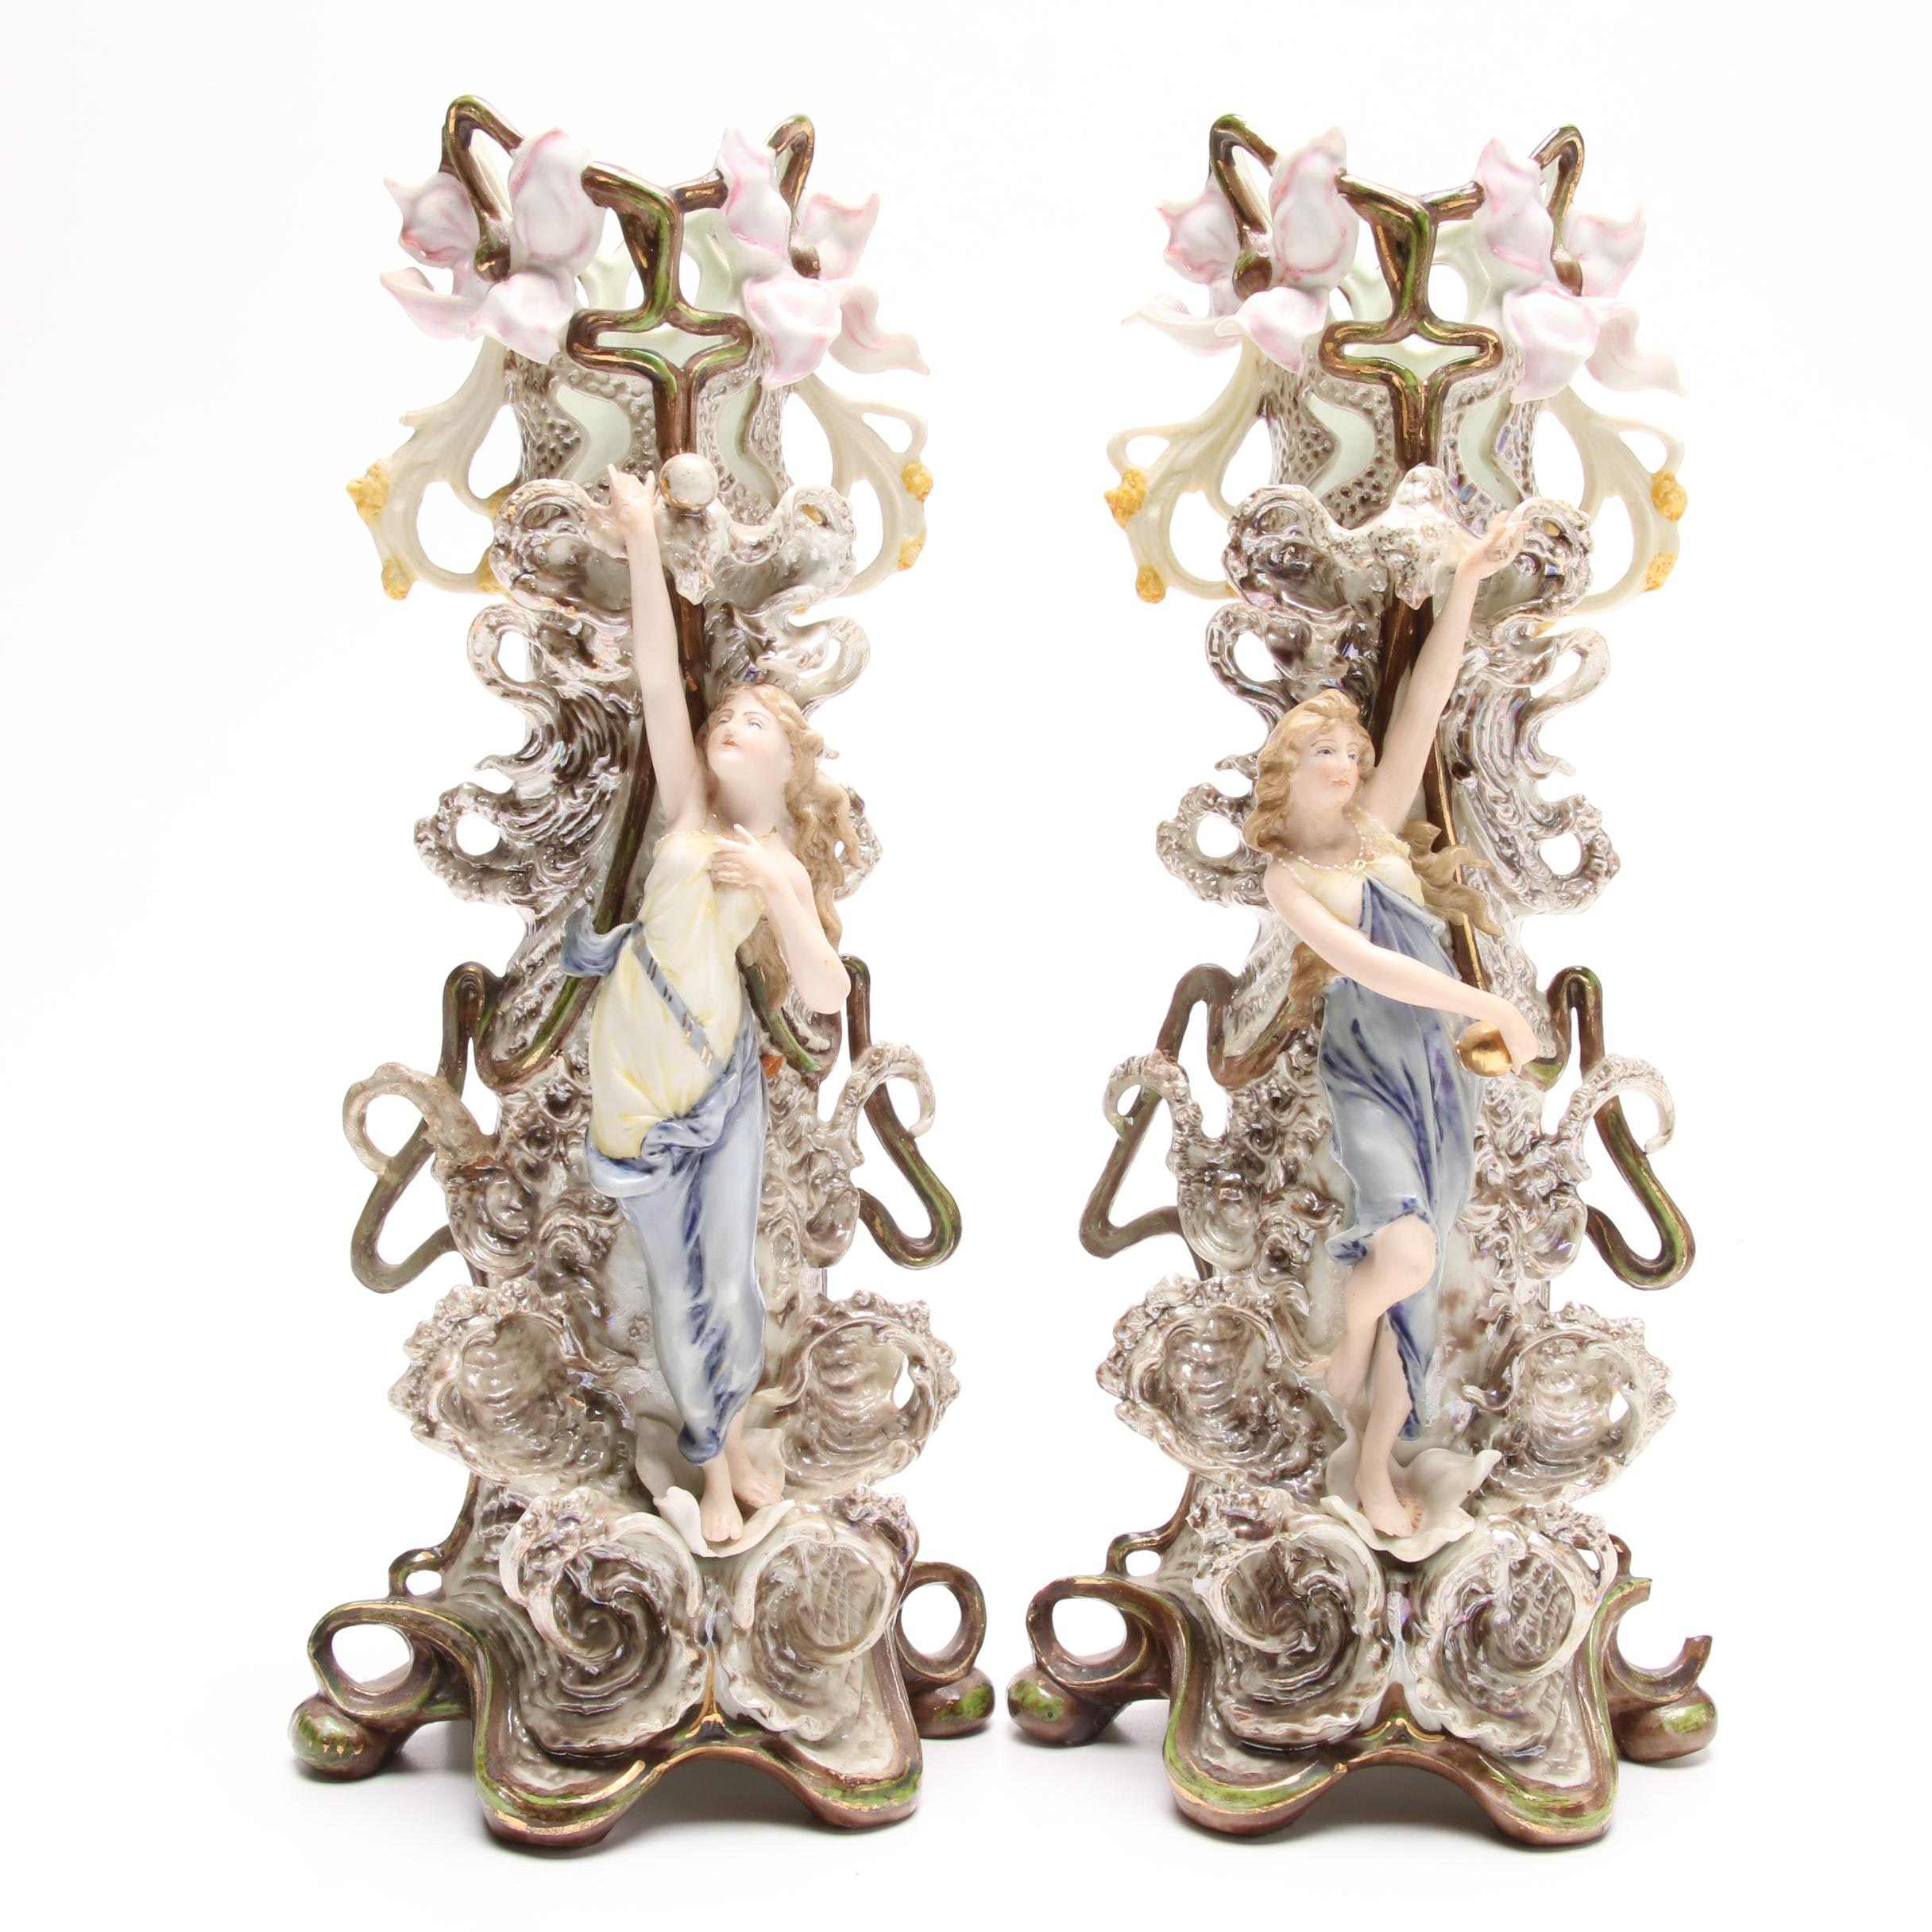 Pair of Antique German Porcelain Figural Vases